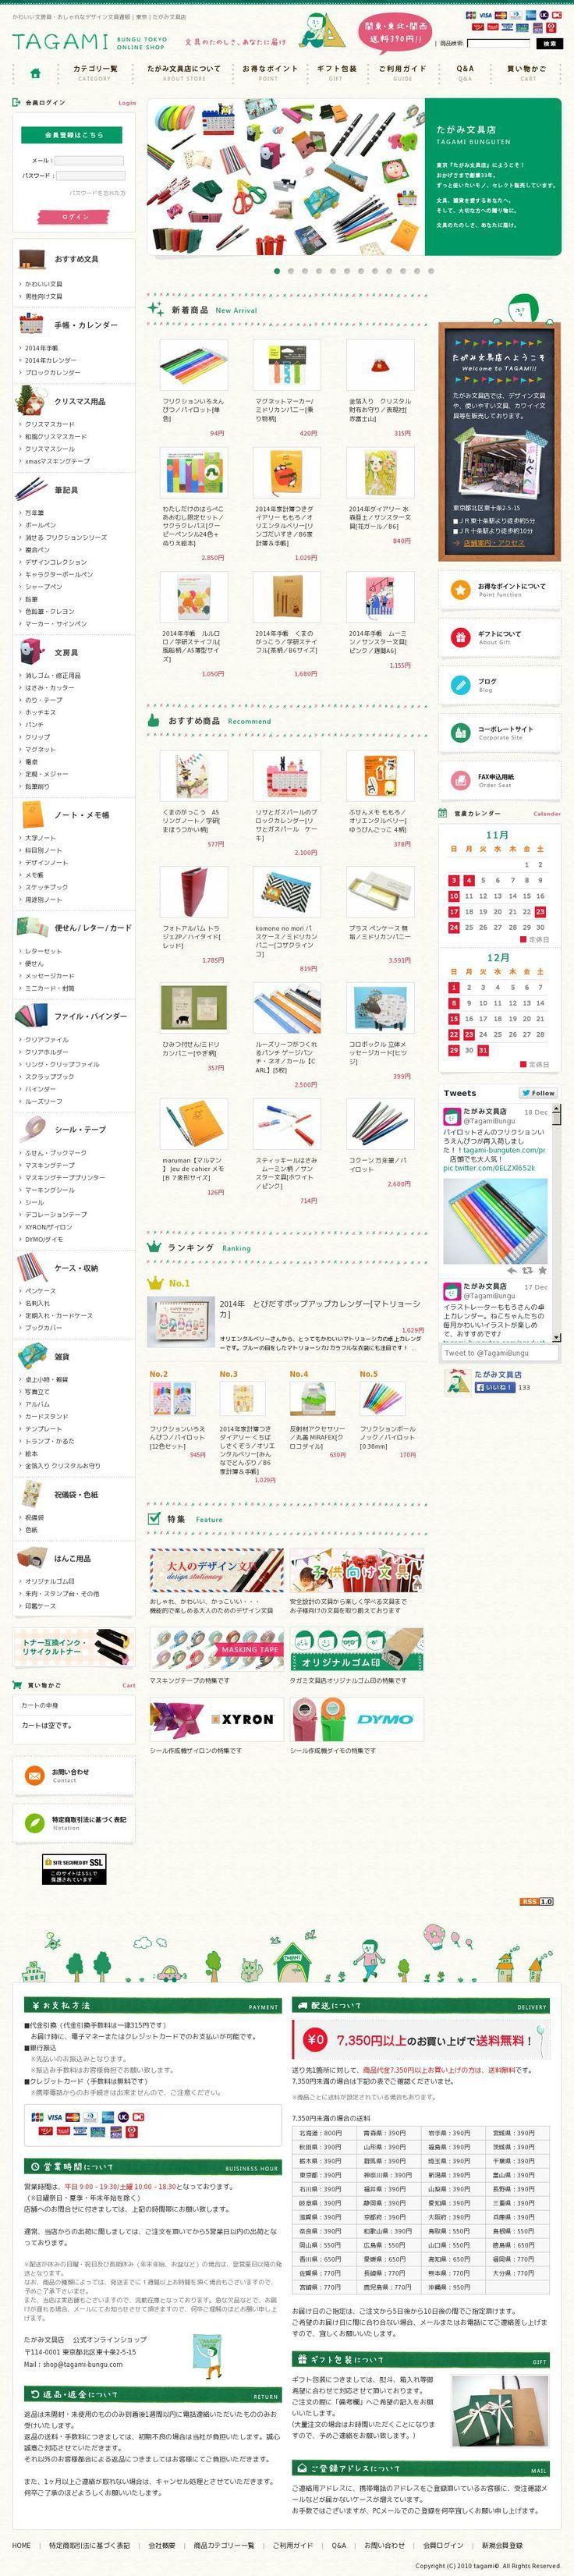 The website 'http://www.tagami-bunguten.com/' courtesy of @Pinstamatic (http://pinstamatic.com)